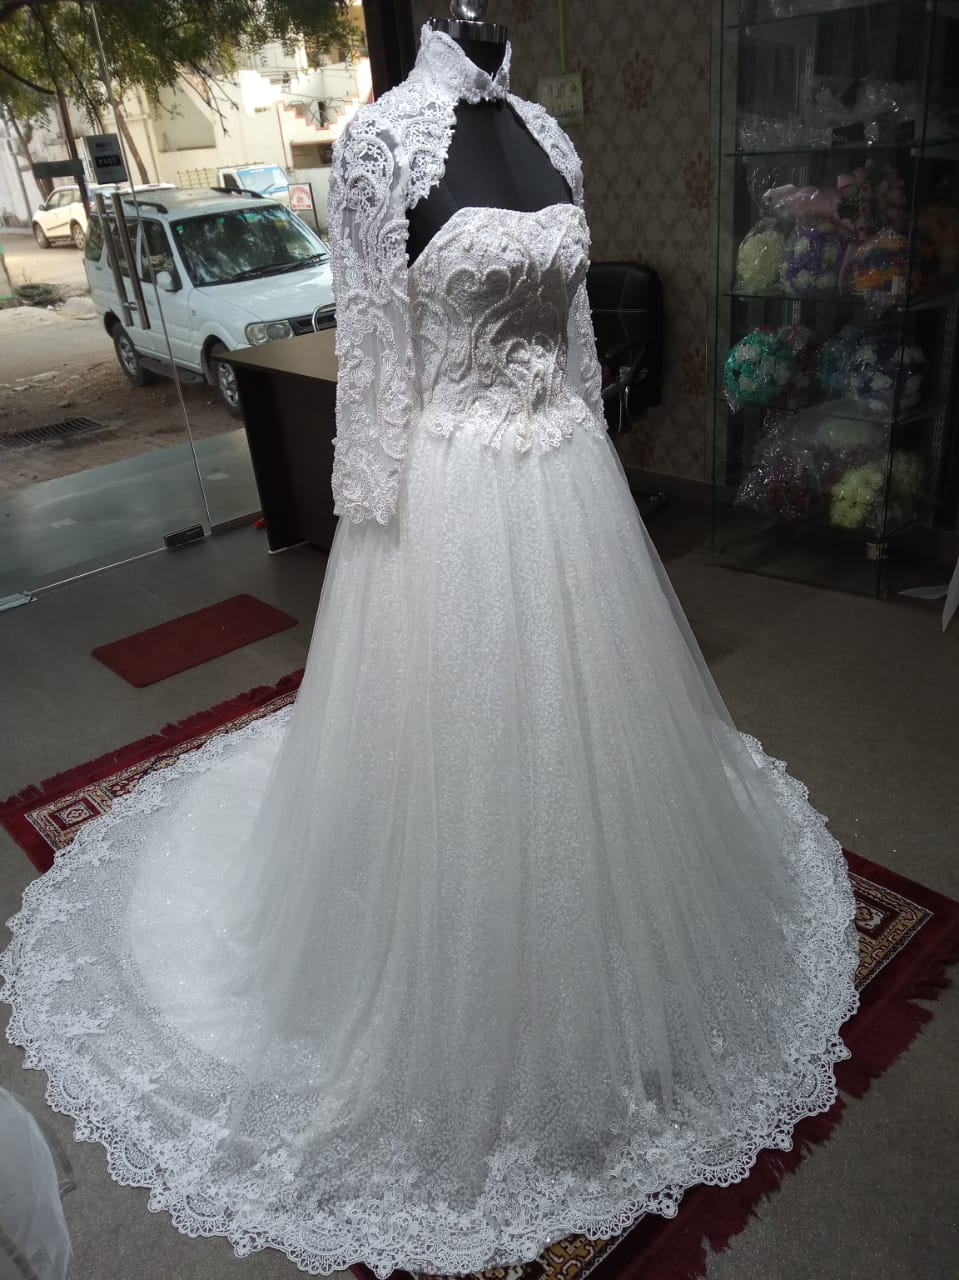 Wedding Topshop - Christian wedding gowns & Dress and Accessories in Raipur, Chhattisgarh